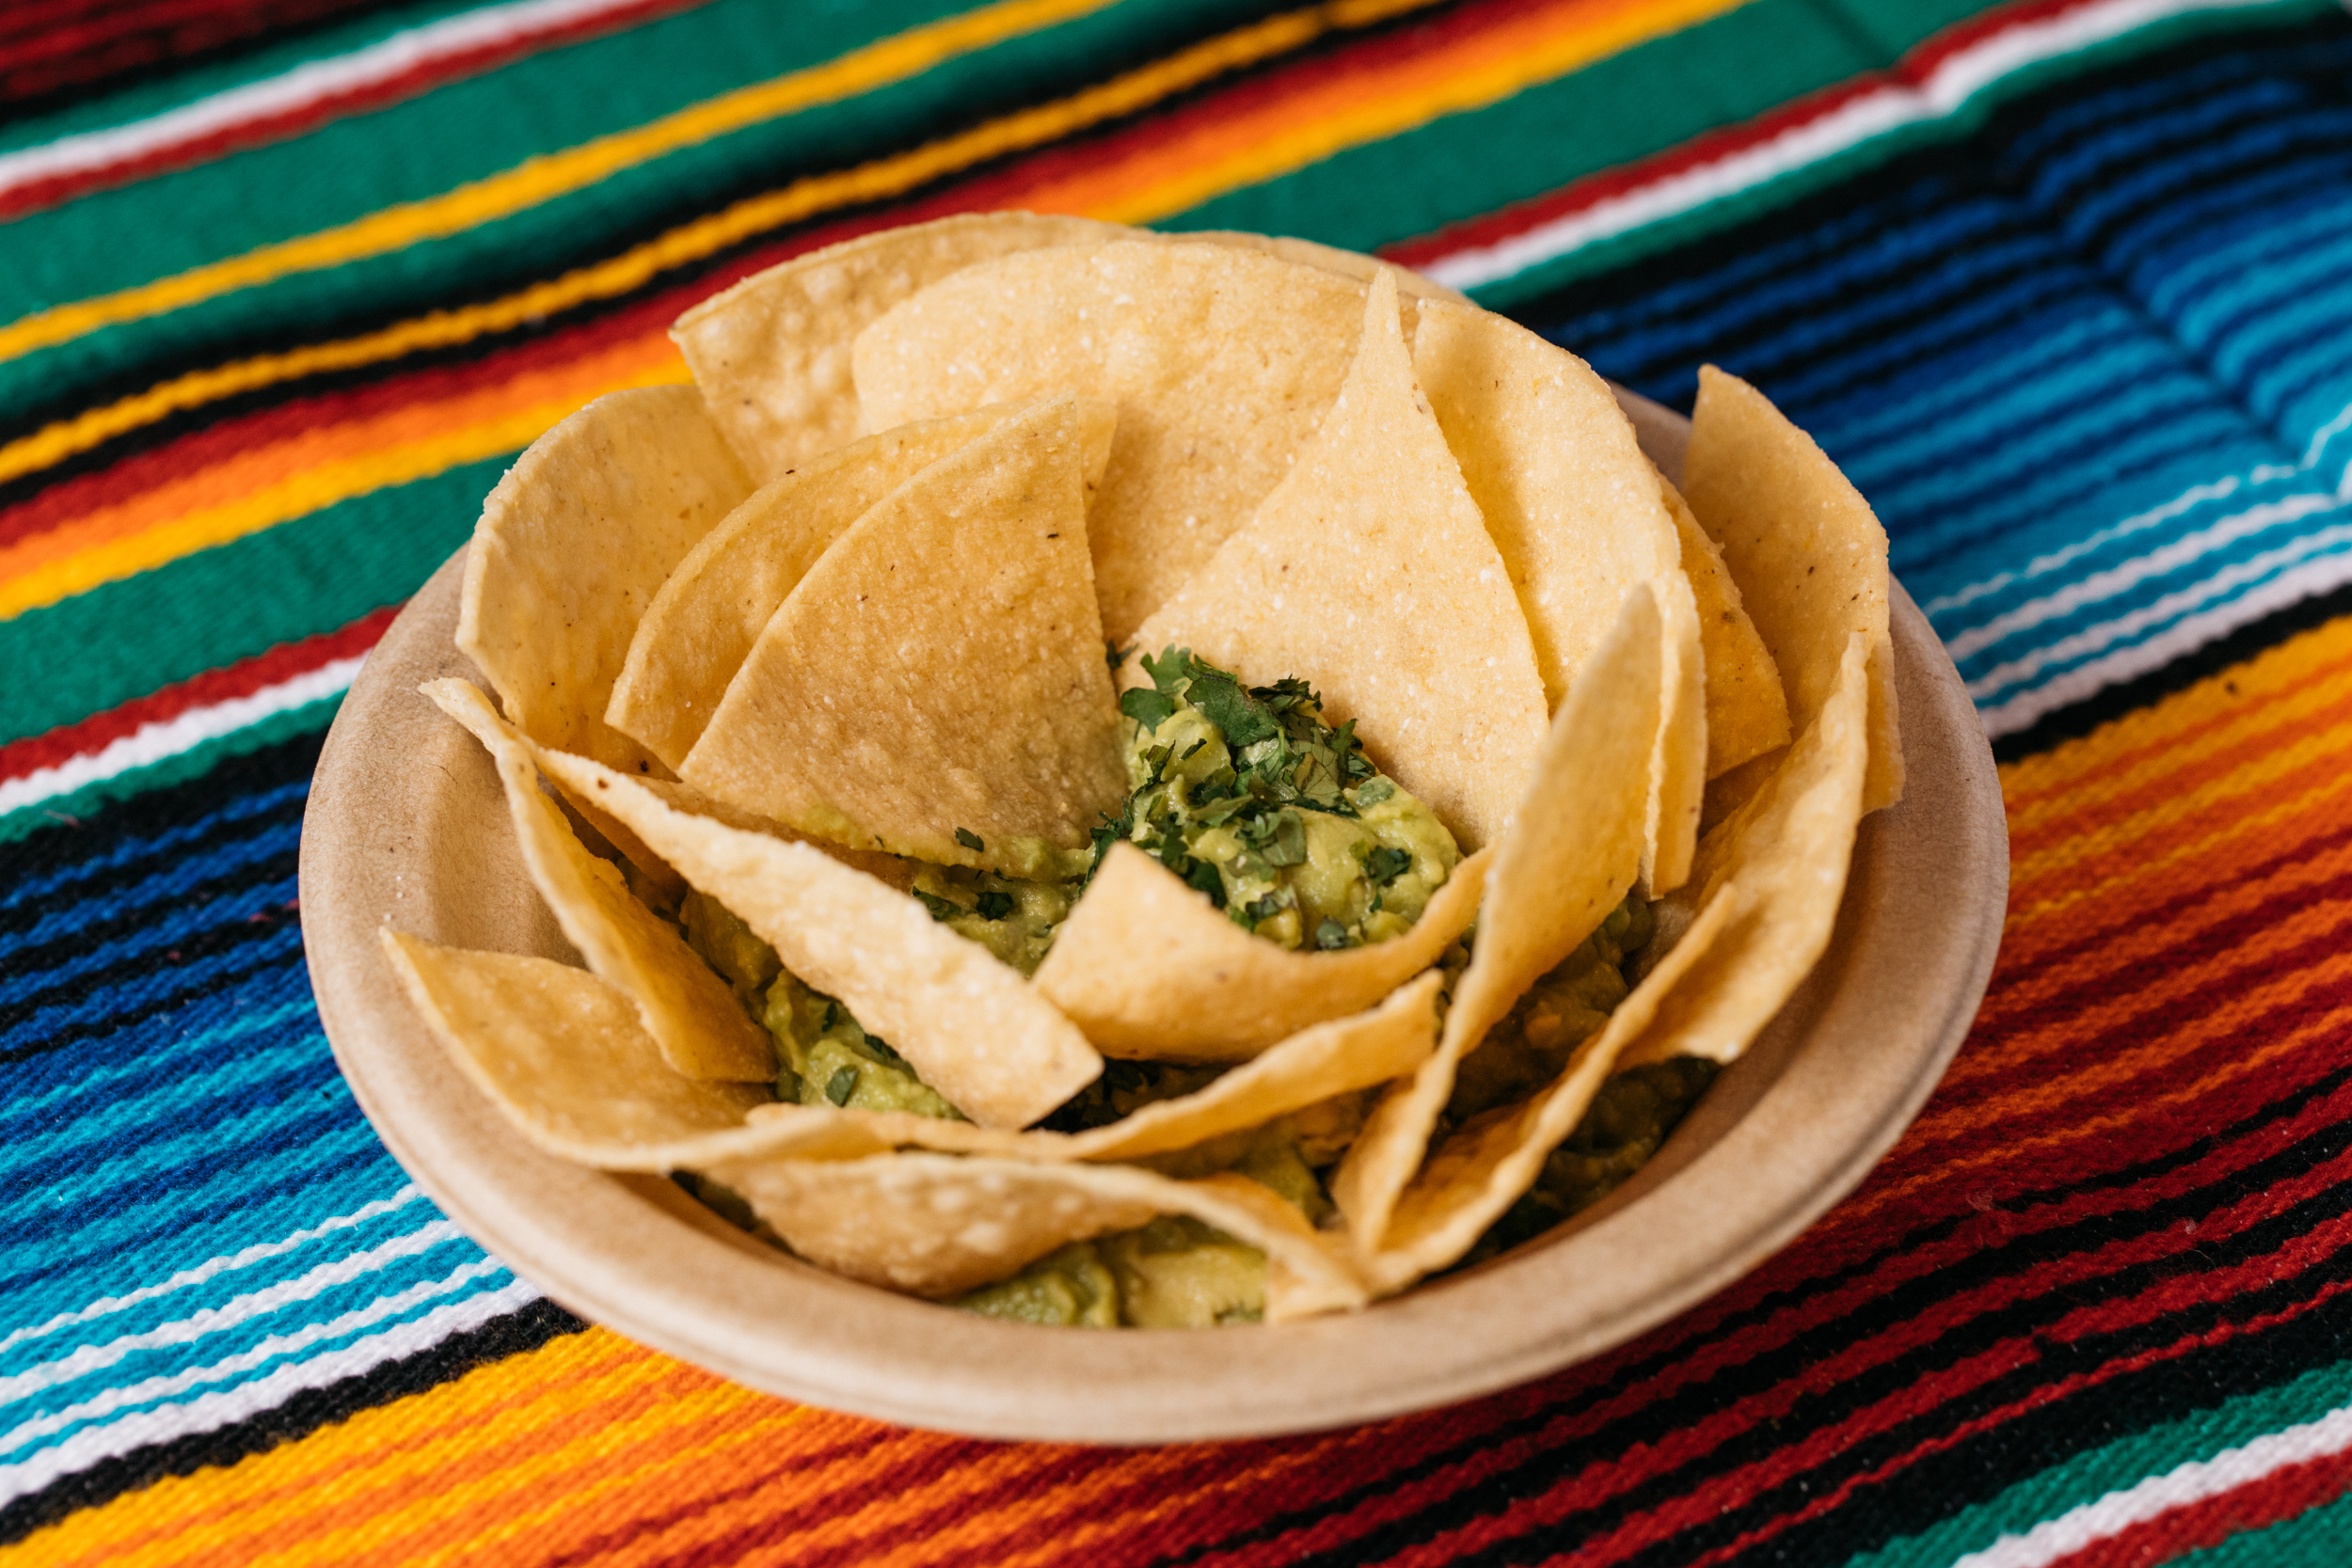 GUAC + CHIPS 8 - VEGAN + GLUTEN FREE. House chips. Avocado, onion, jalapeño, lime, cilantro.